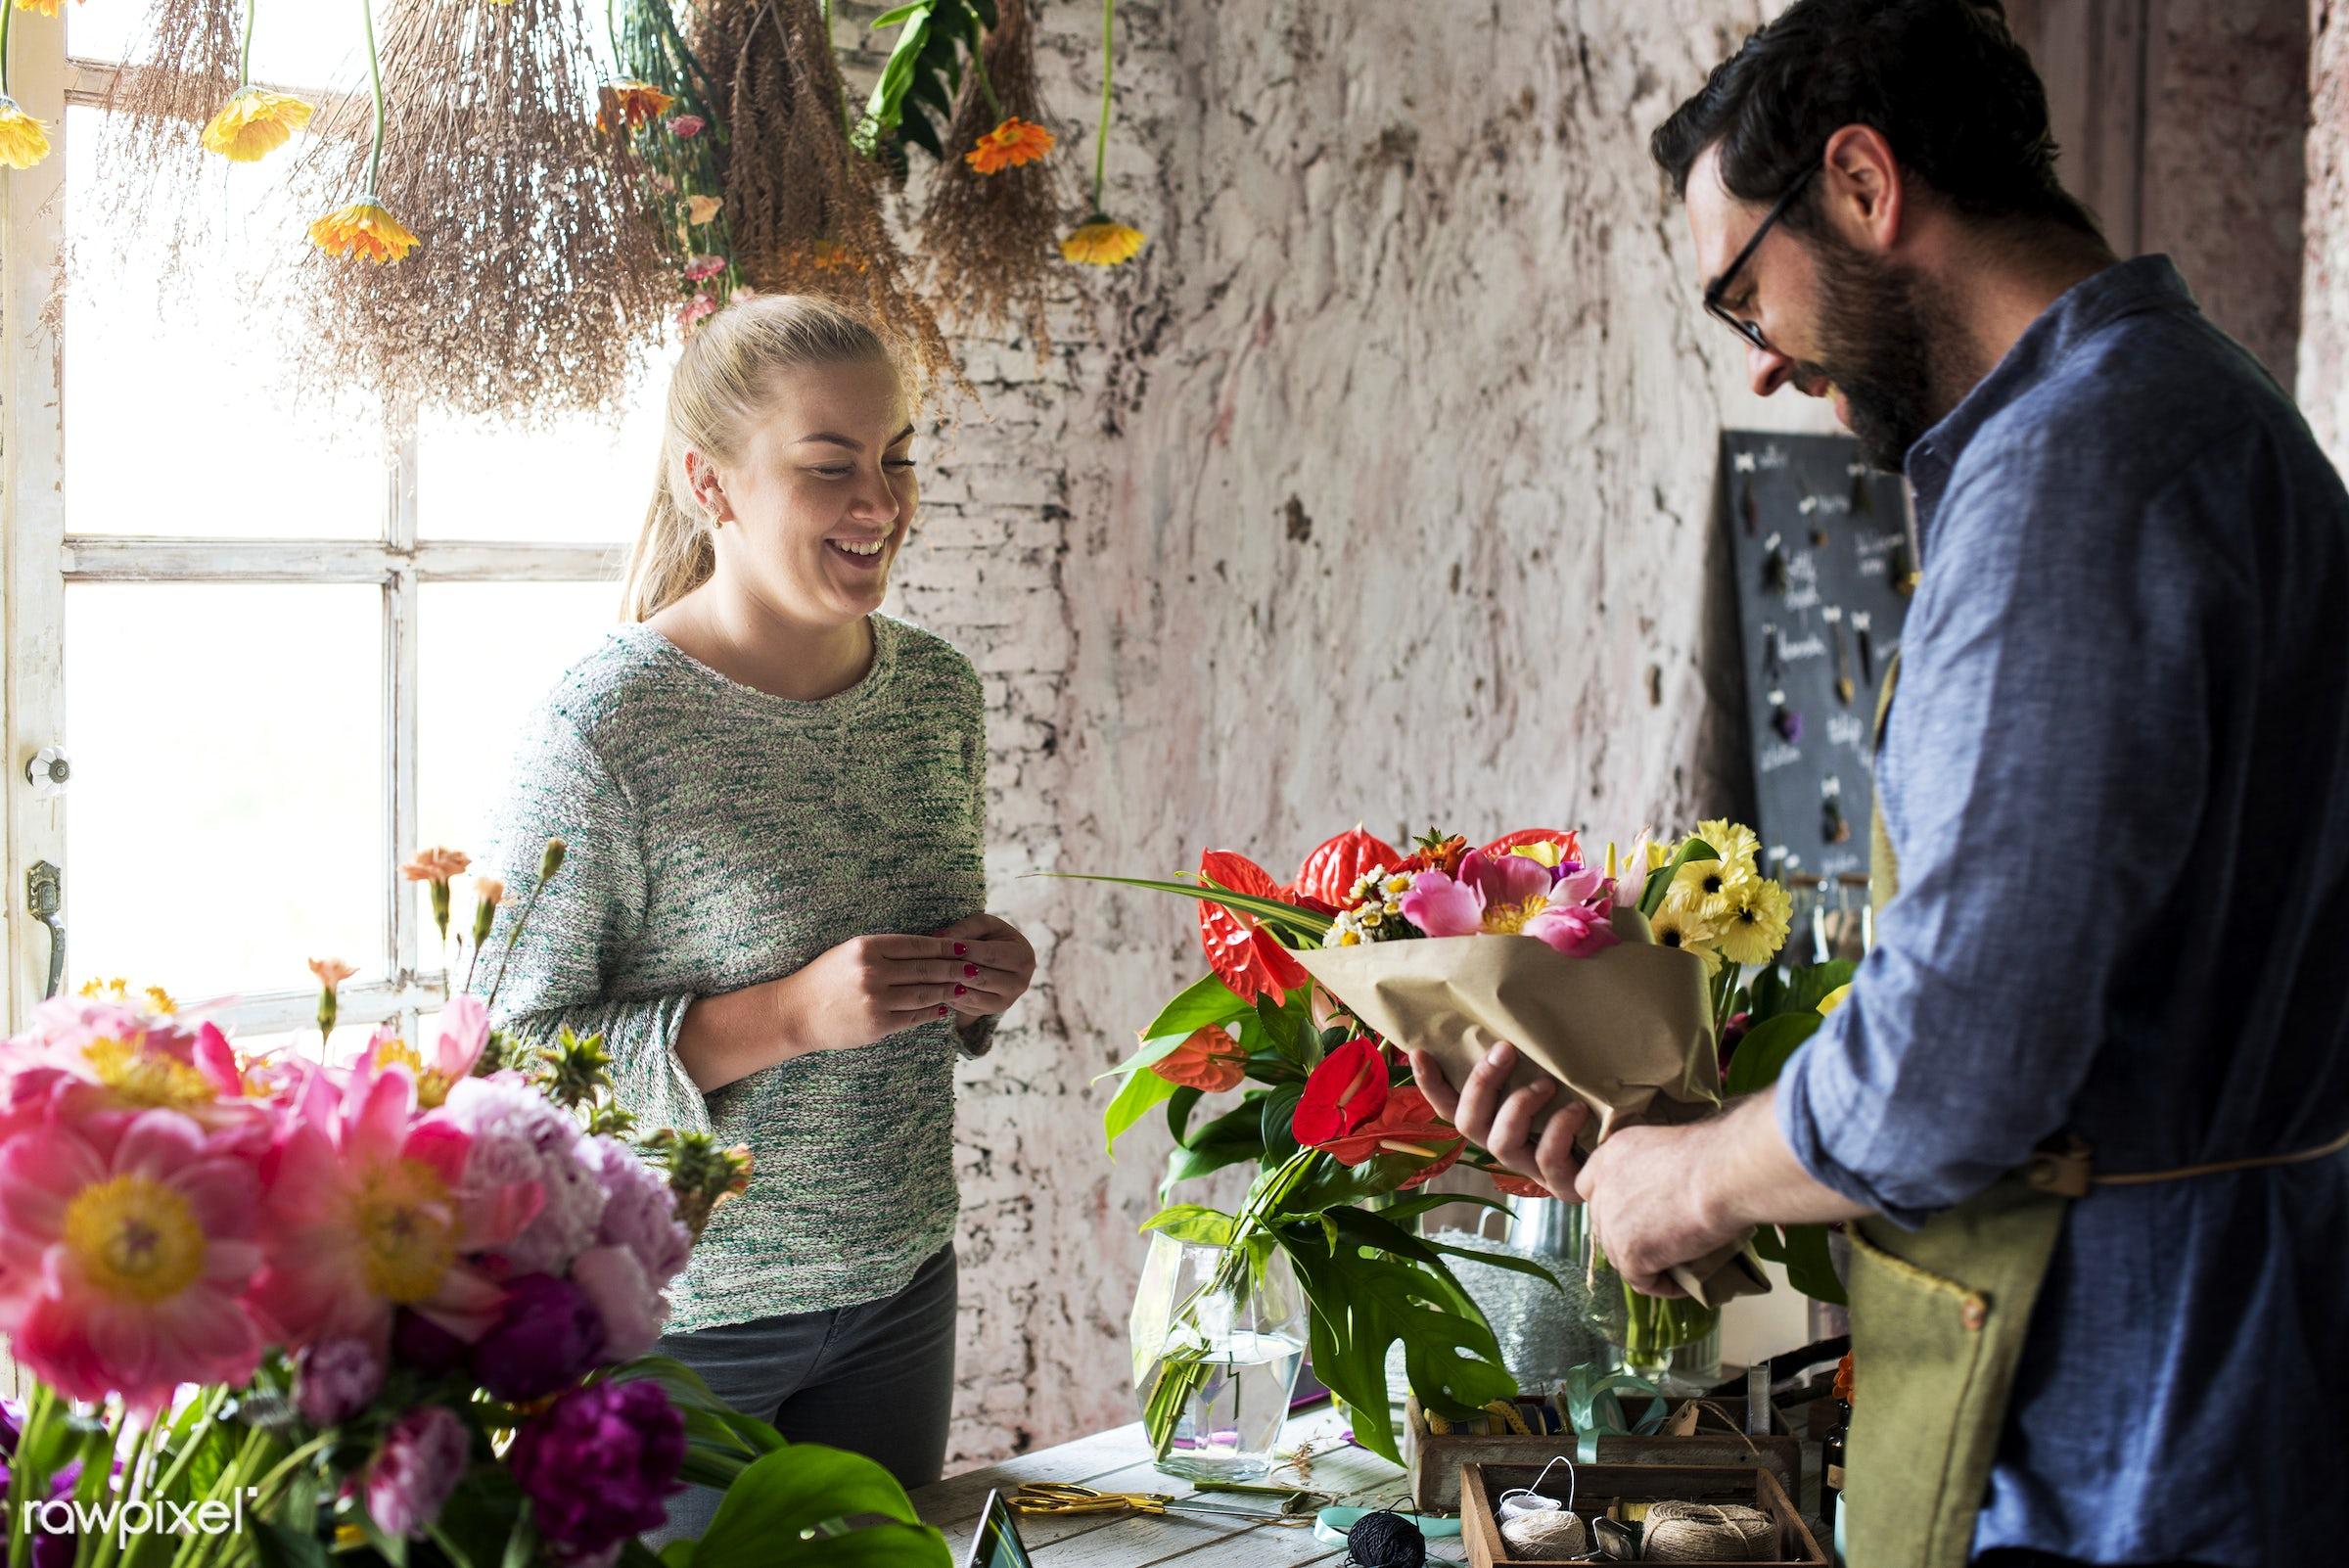 plant, bouquet, buy, customer, fresh, couple, partner, flower, selling, decoration, flora, refreshment, leisure, florist,...